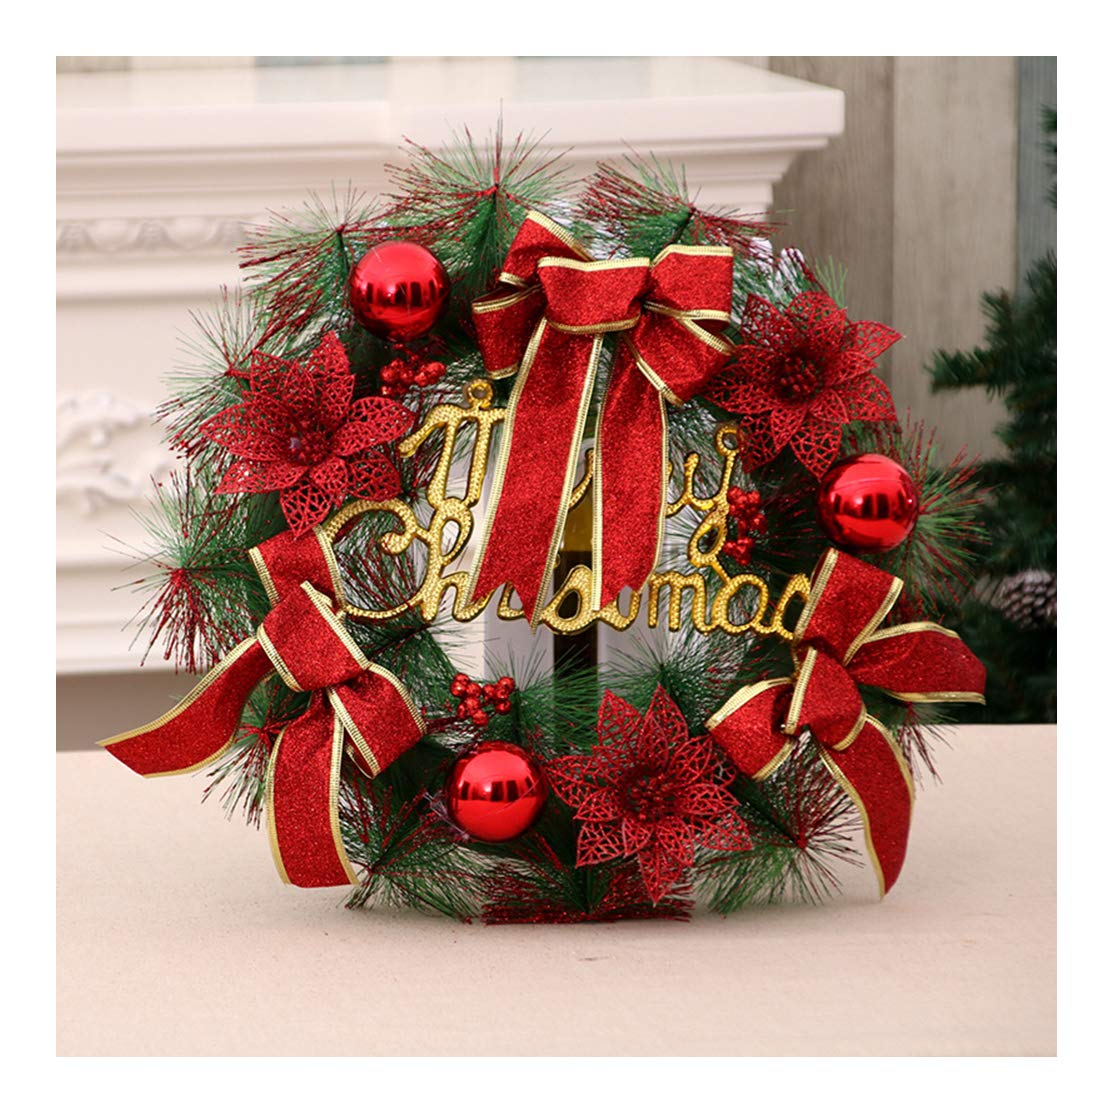 Deecen Standard Size Case, Christmas Flower Rattan Circle Ornament Simulation Christmas Wreath Mall Facade Decoration 16x16 Inch (40x40CM) - Red